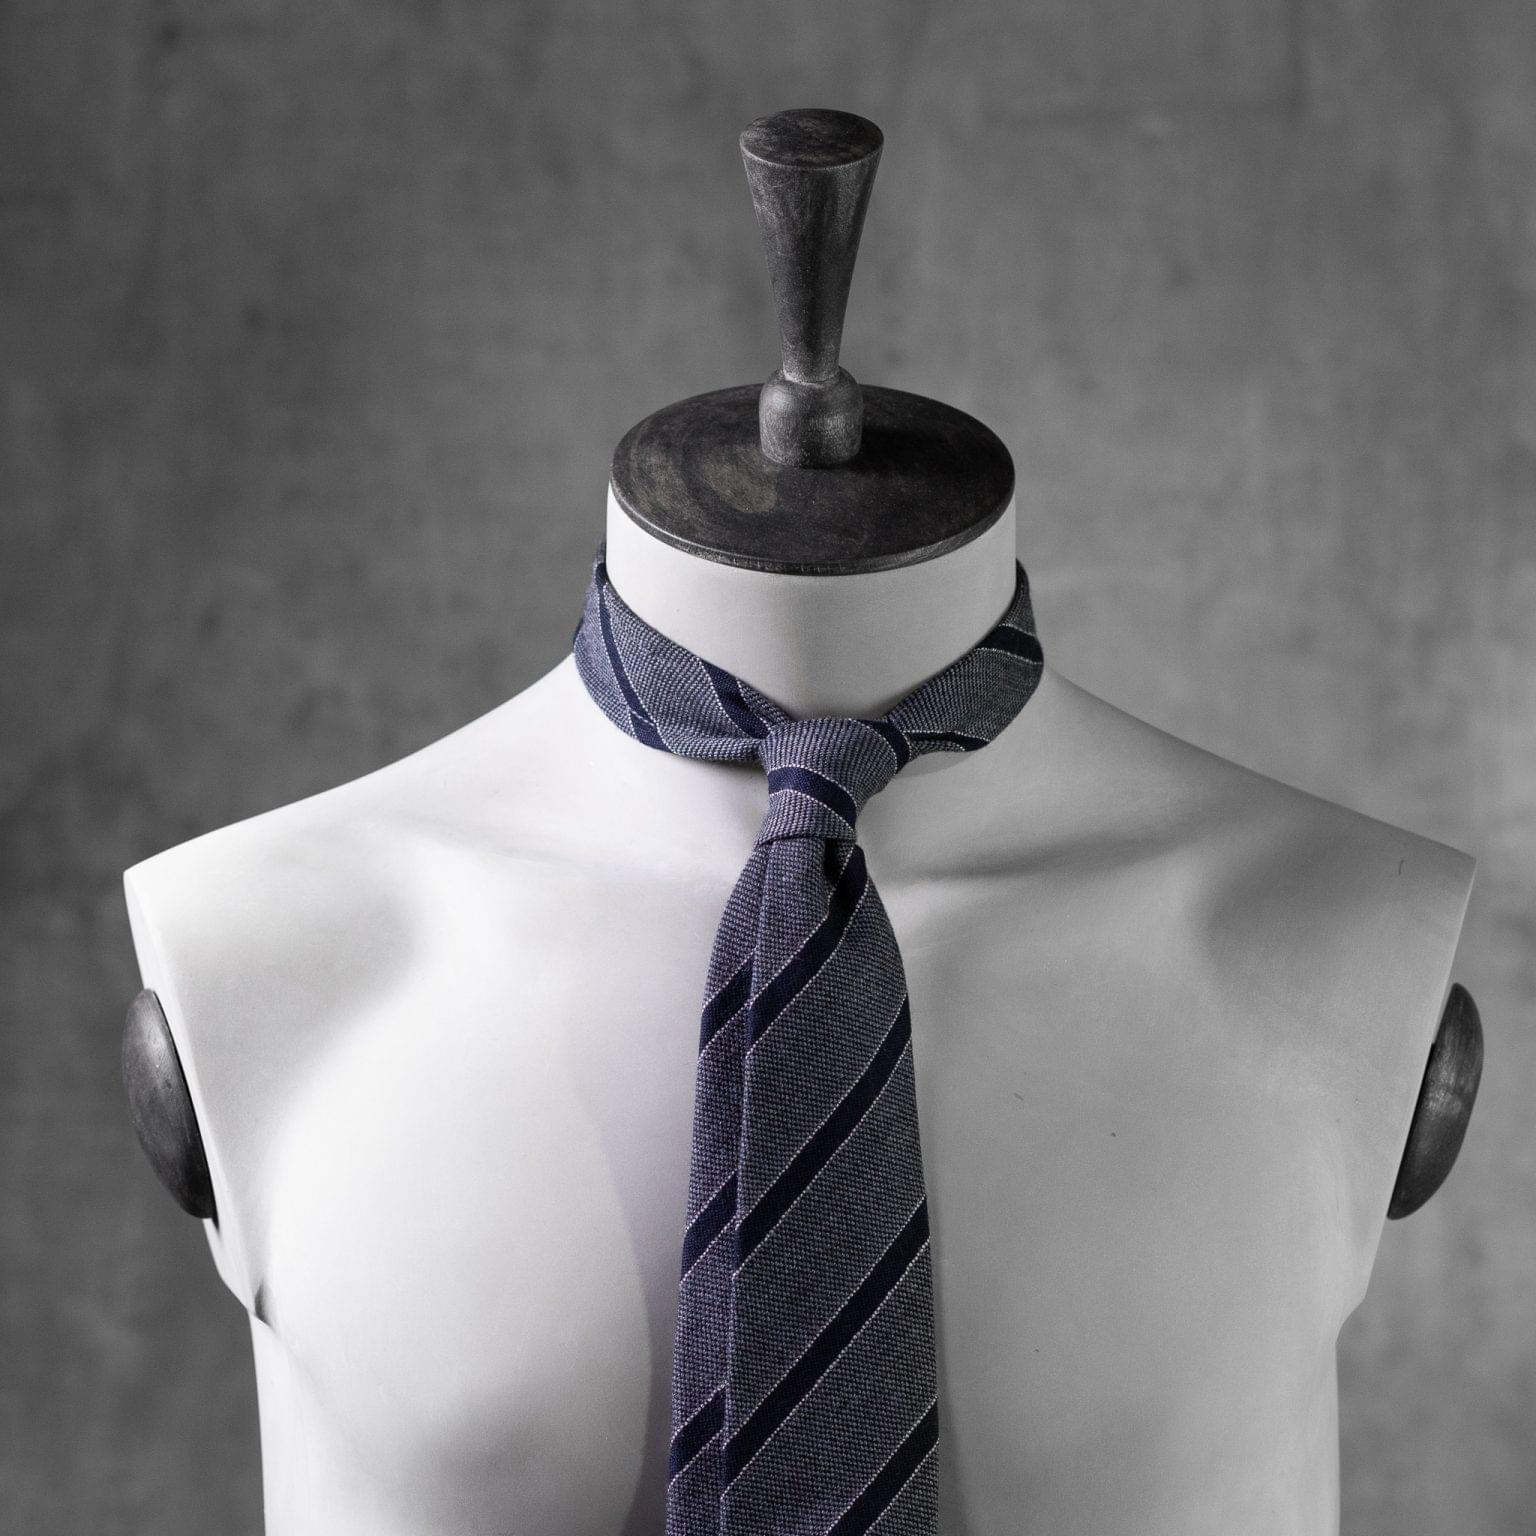 WOOL-LANA-0513-Tie-Initials-Corbata-Iniciales-The-Seelk-3